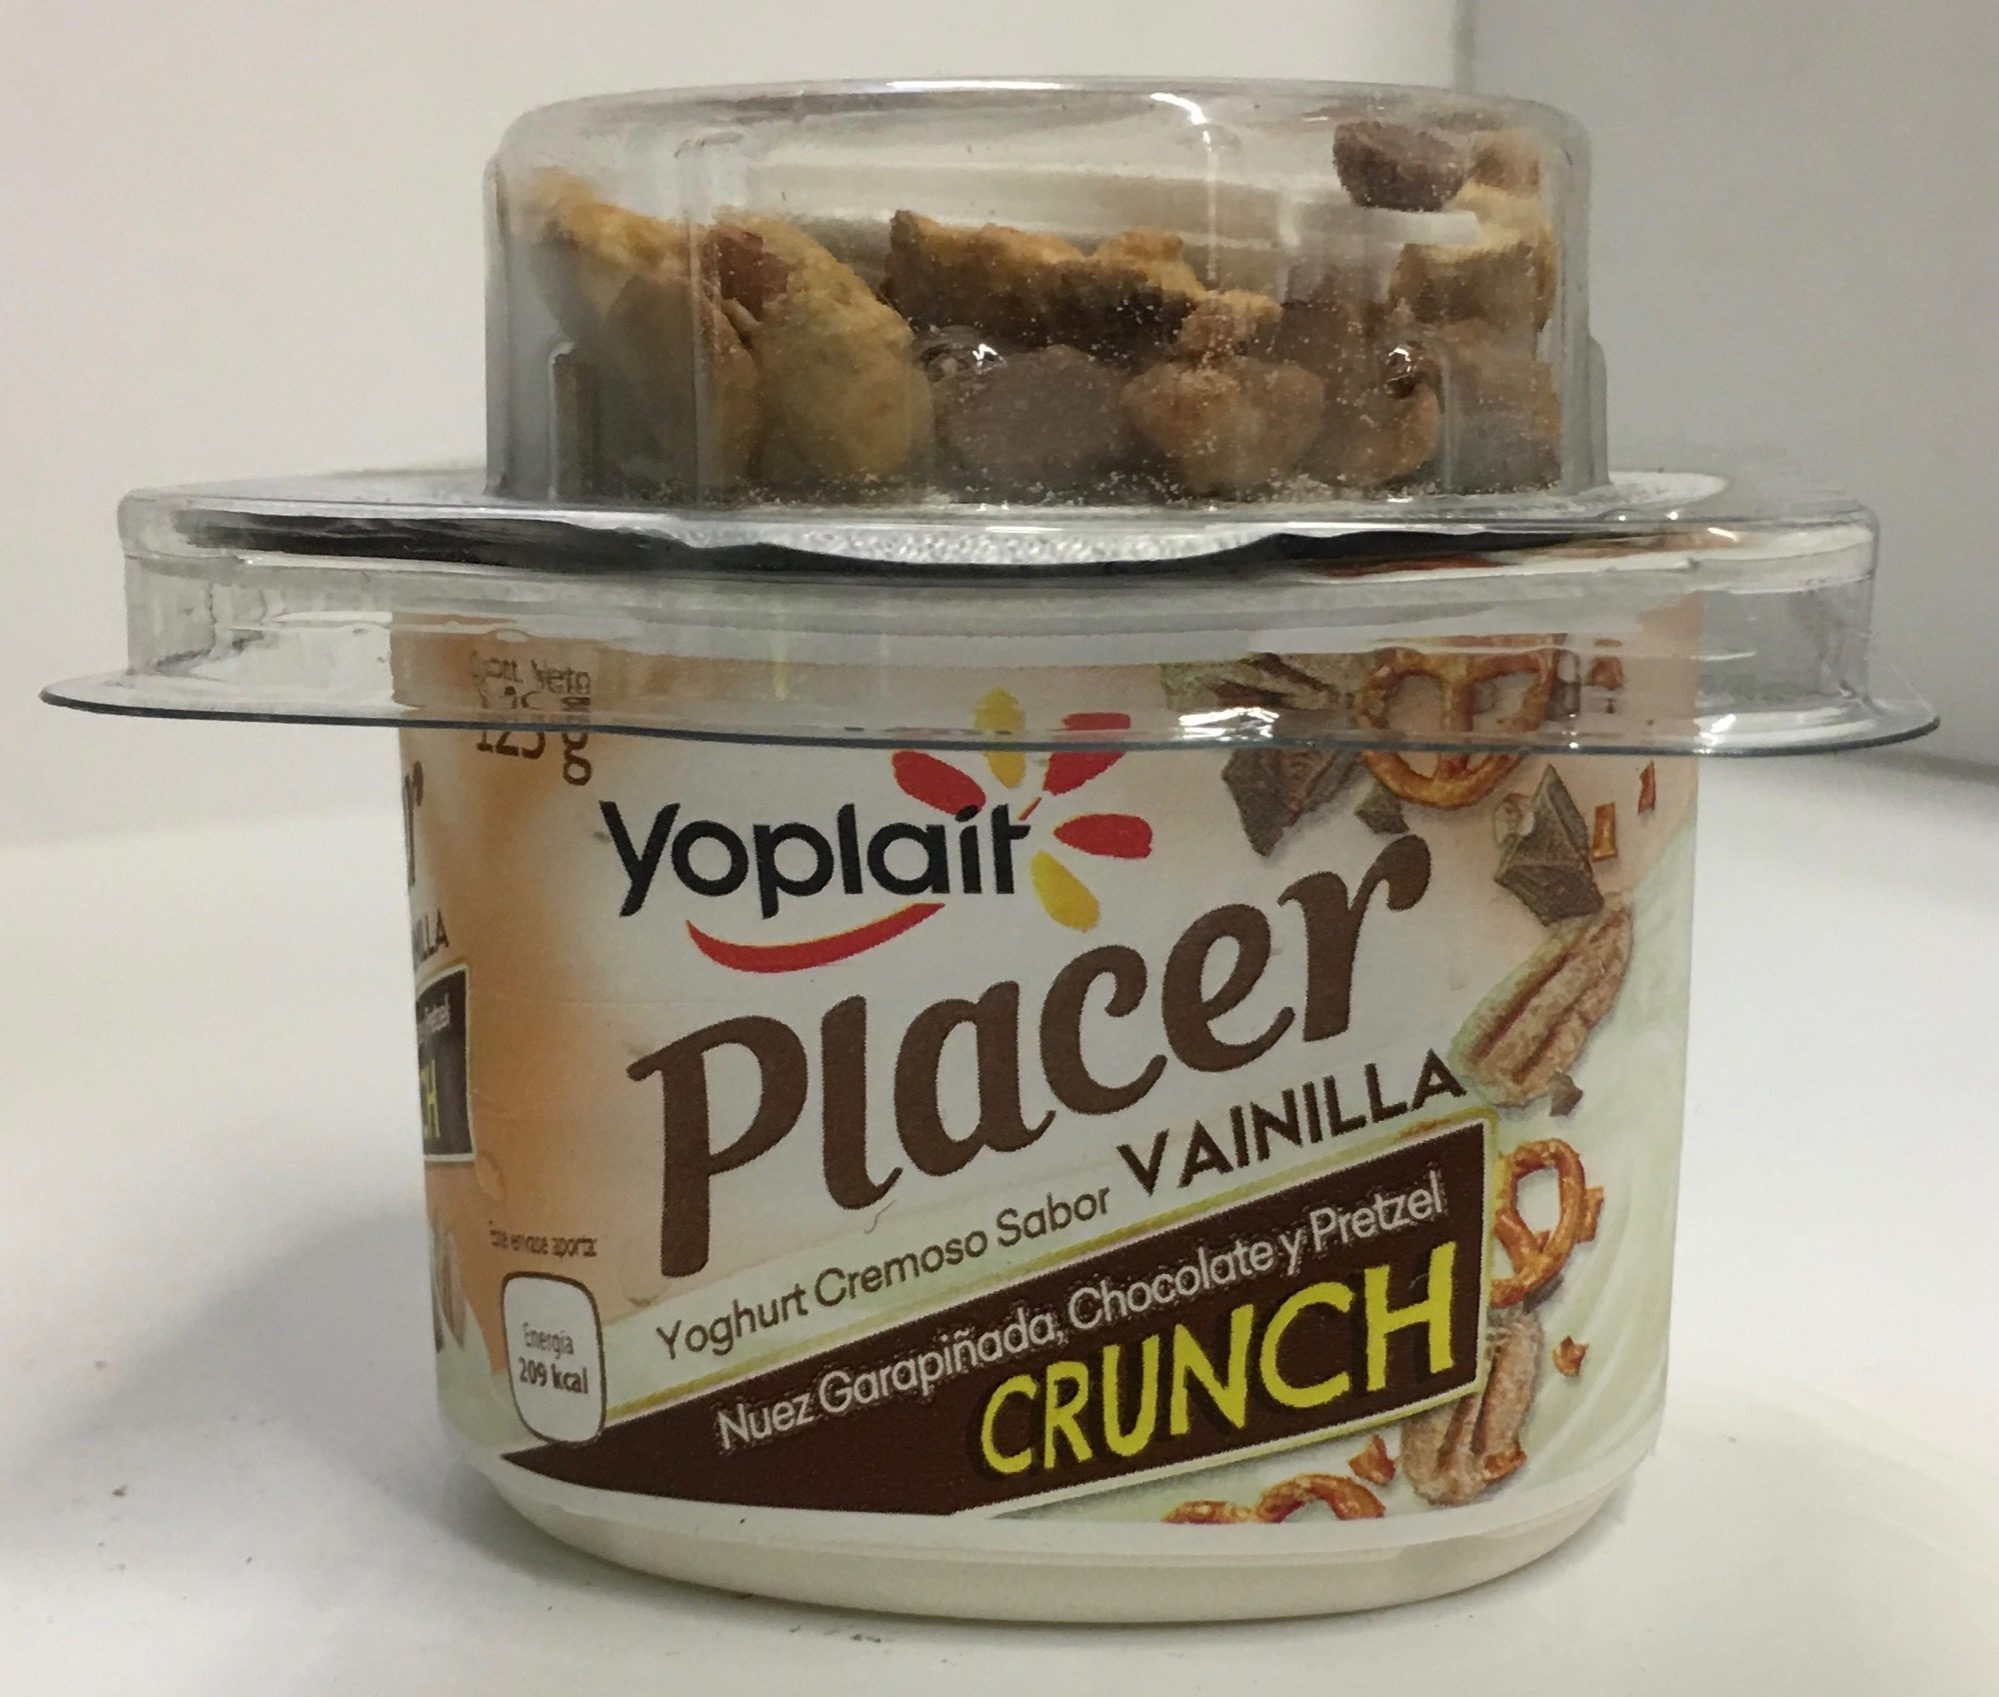 Yogur Placer Vainilla Yoplait - Product